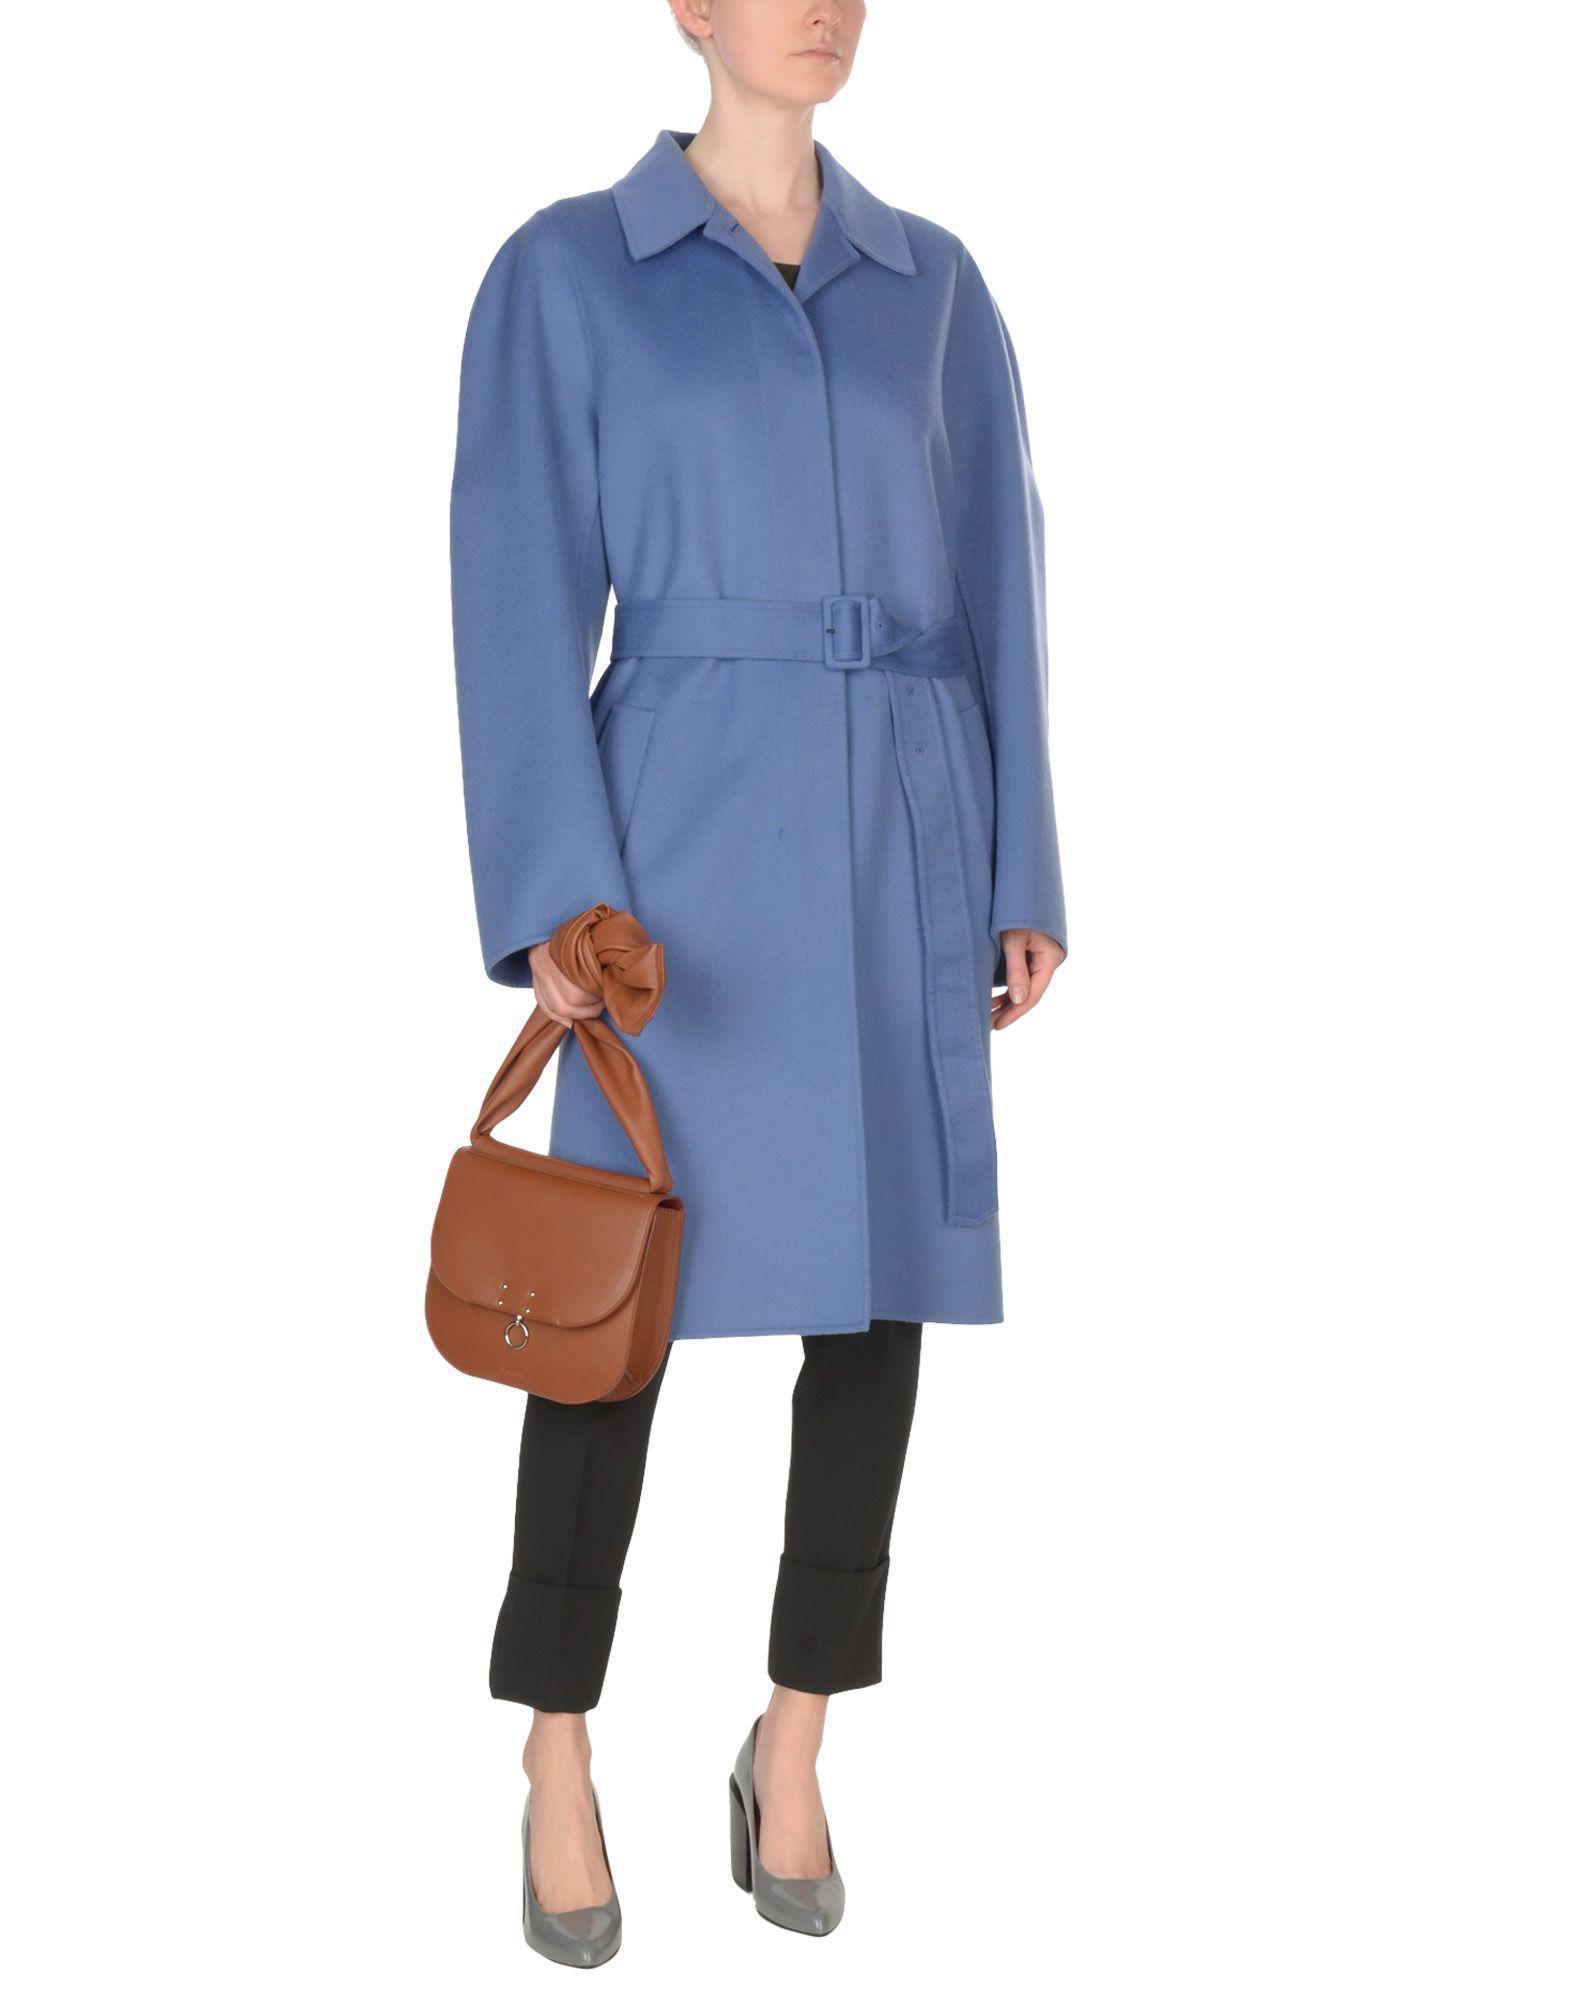 Jil Sander Leather Cross-body Bag in Brown